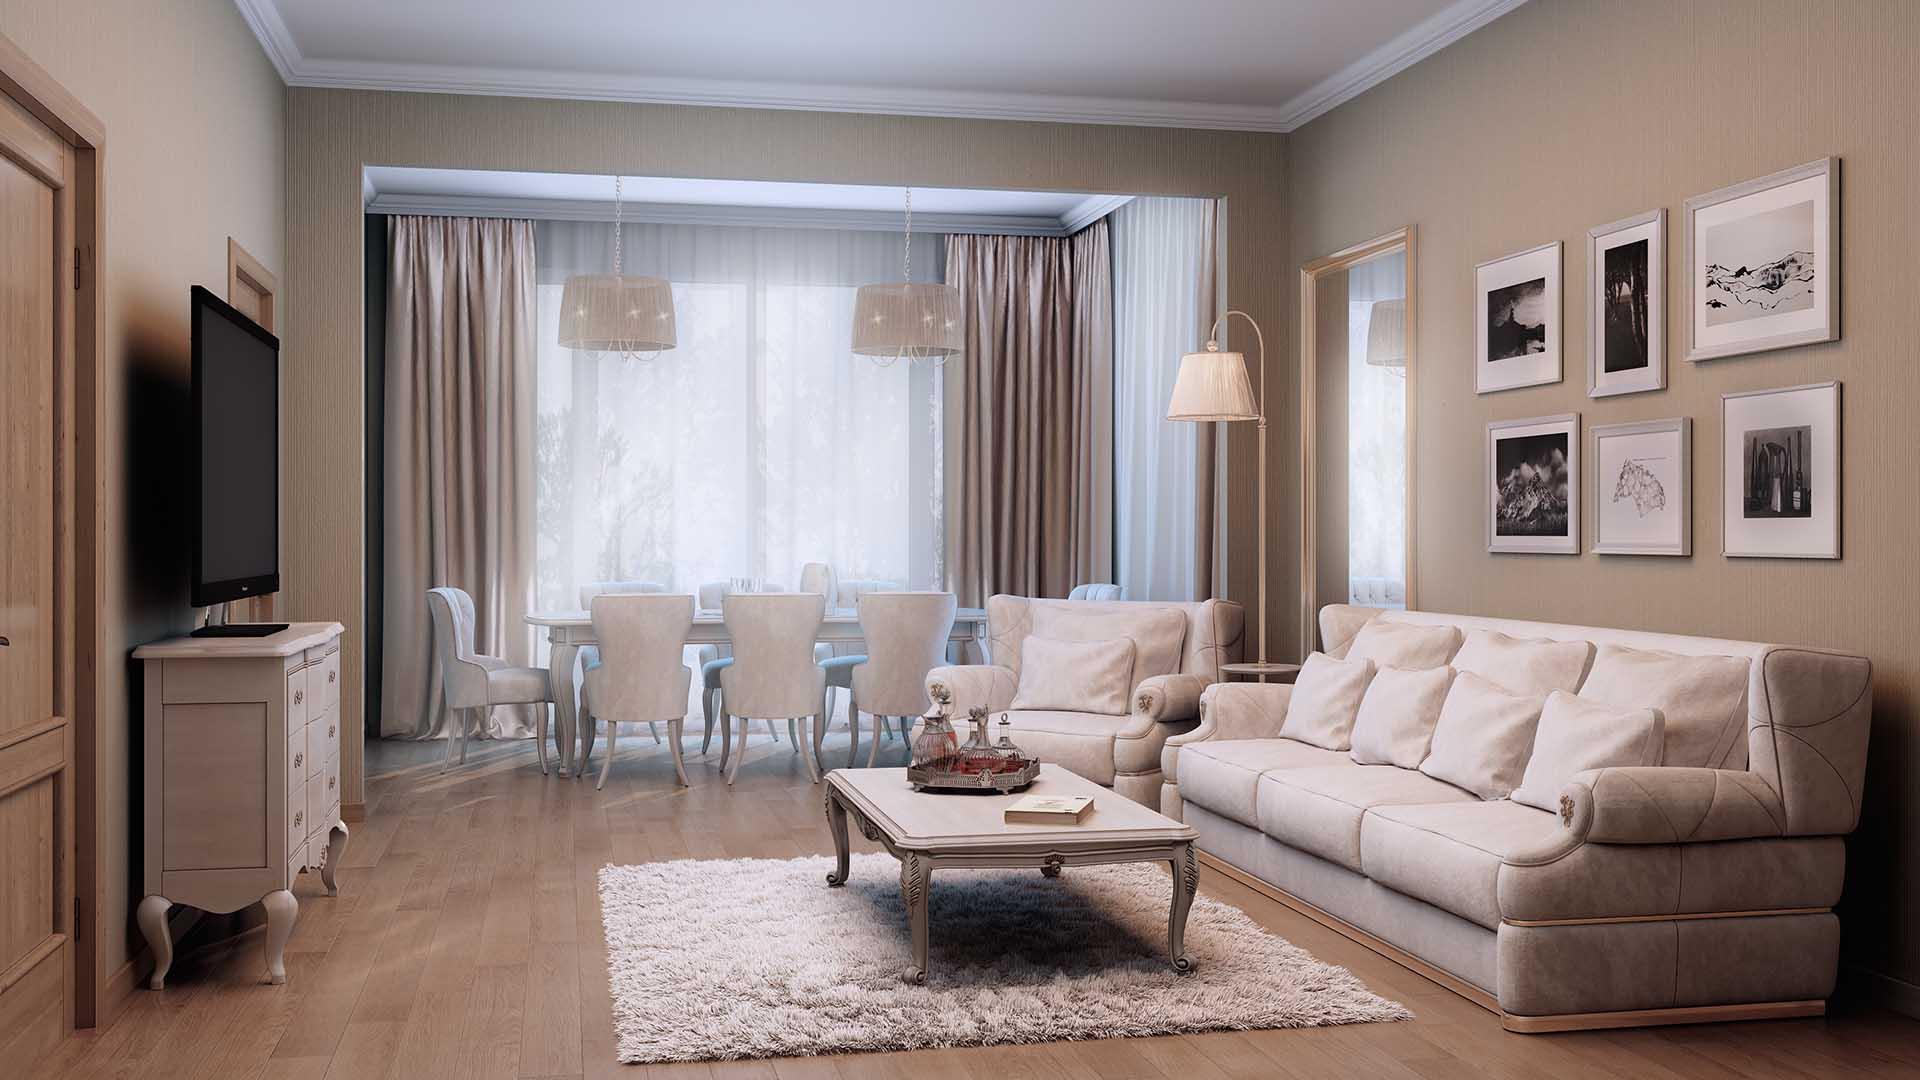 Дизайн зала в квартире 24 кв.м фото